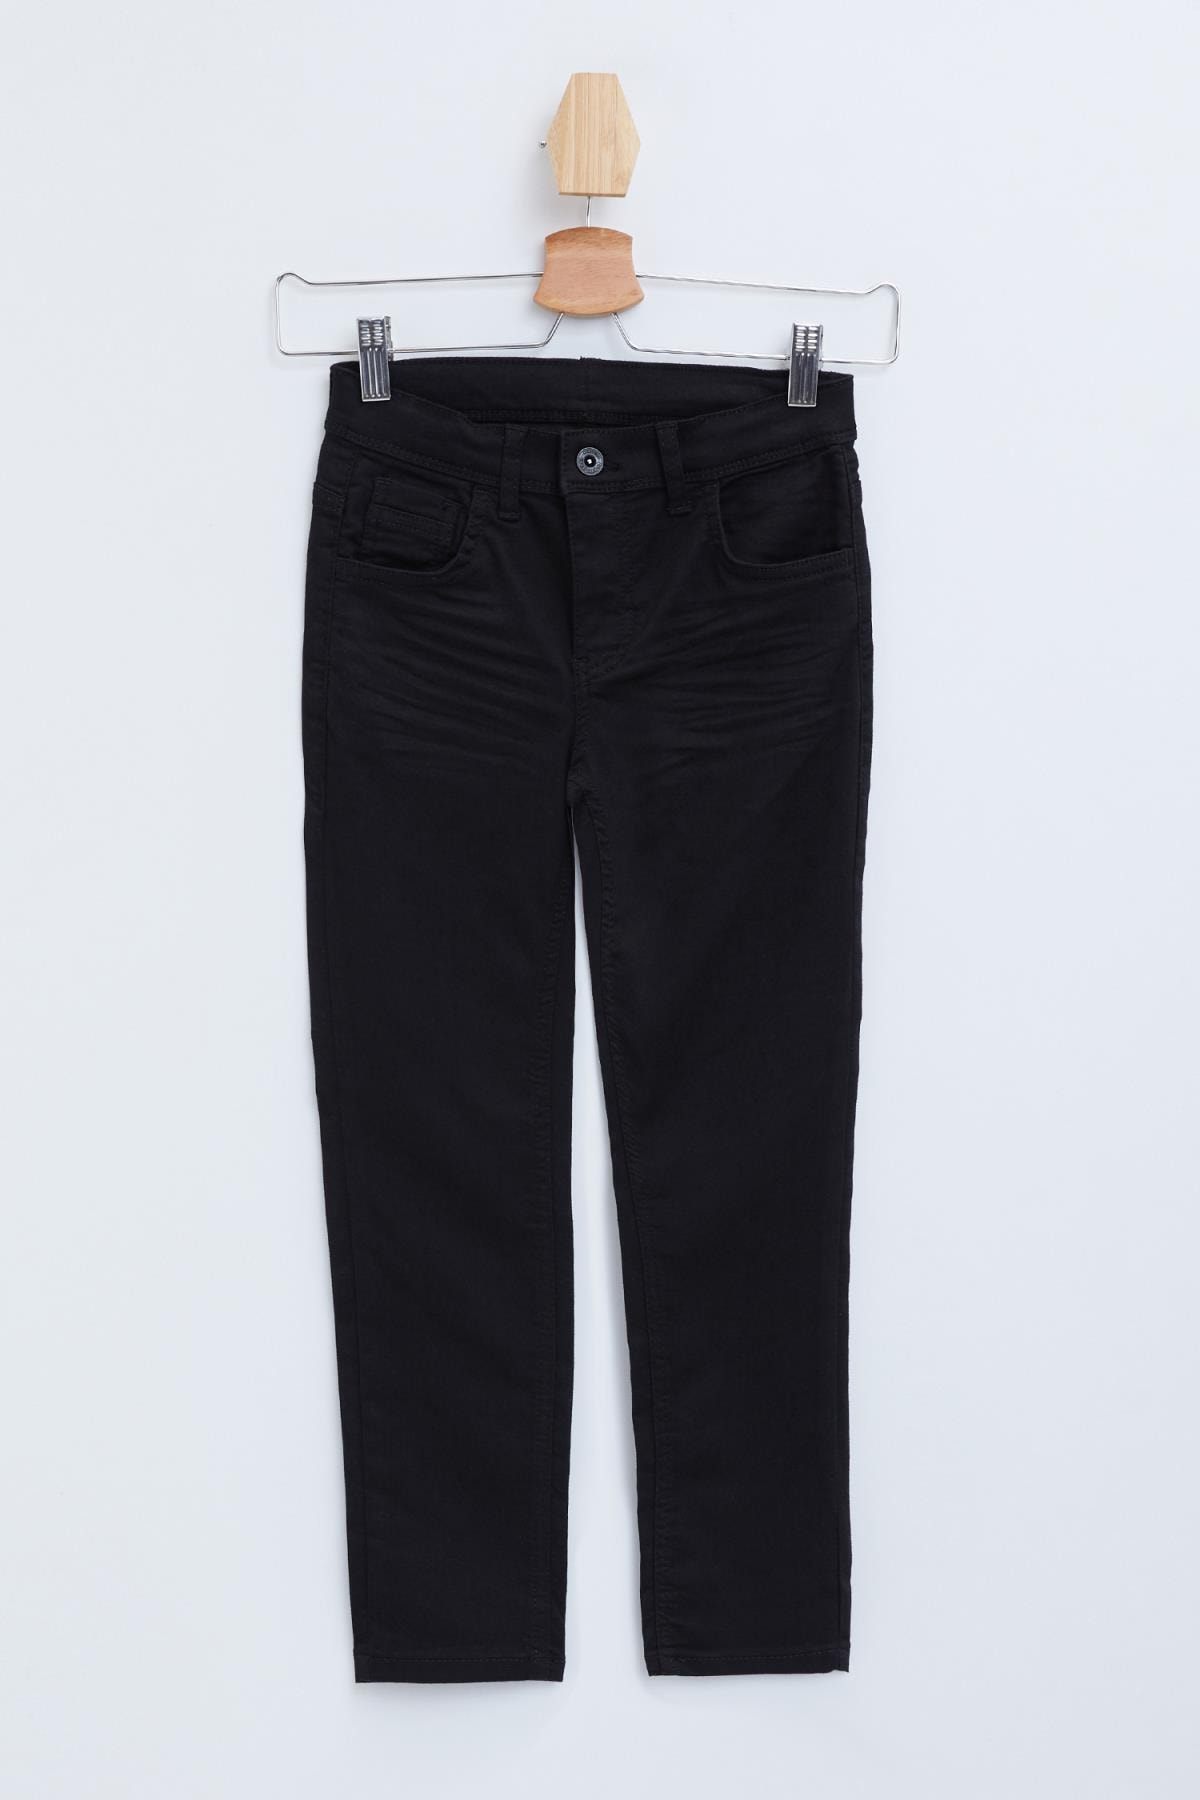 DeFacto Erkek Çocuk Siyah Kot Pantolon